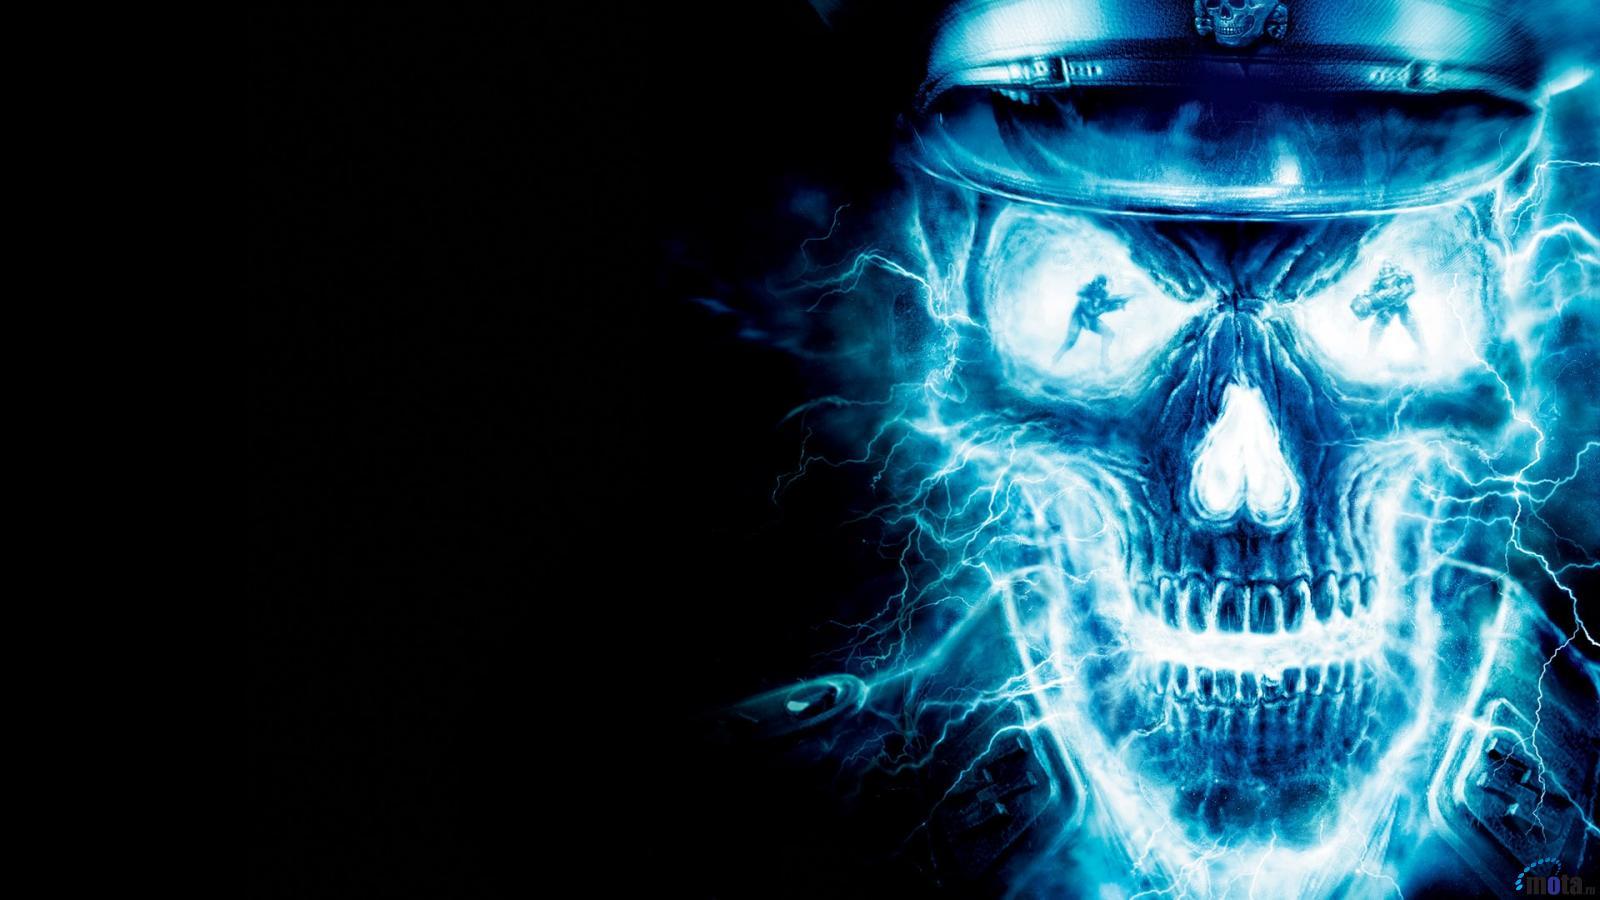 http://3.bp.blogspot.com/-6z4s5gkXv1s/Tx4eVfEZrQI/AAAAAAAABsQ/MjPeUnC47XI/s1600/Skull+Wallpaper+5.jpg